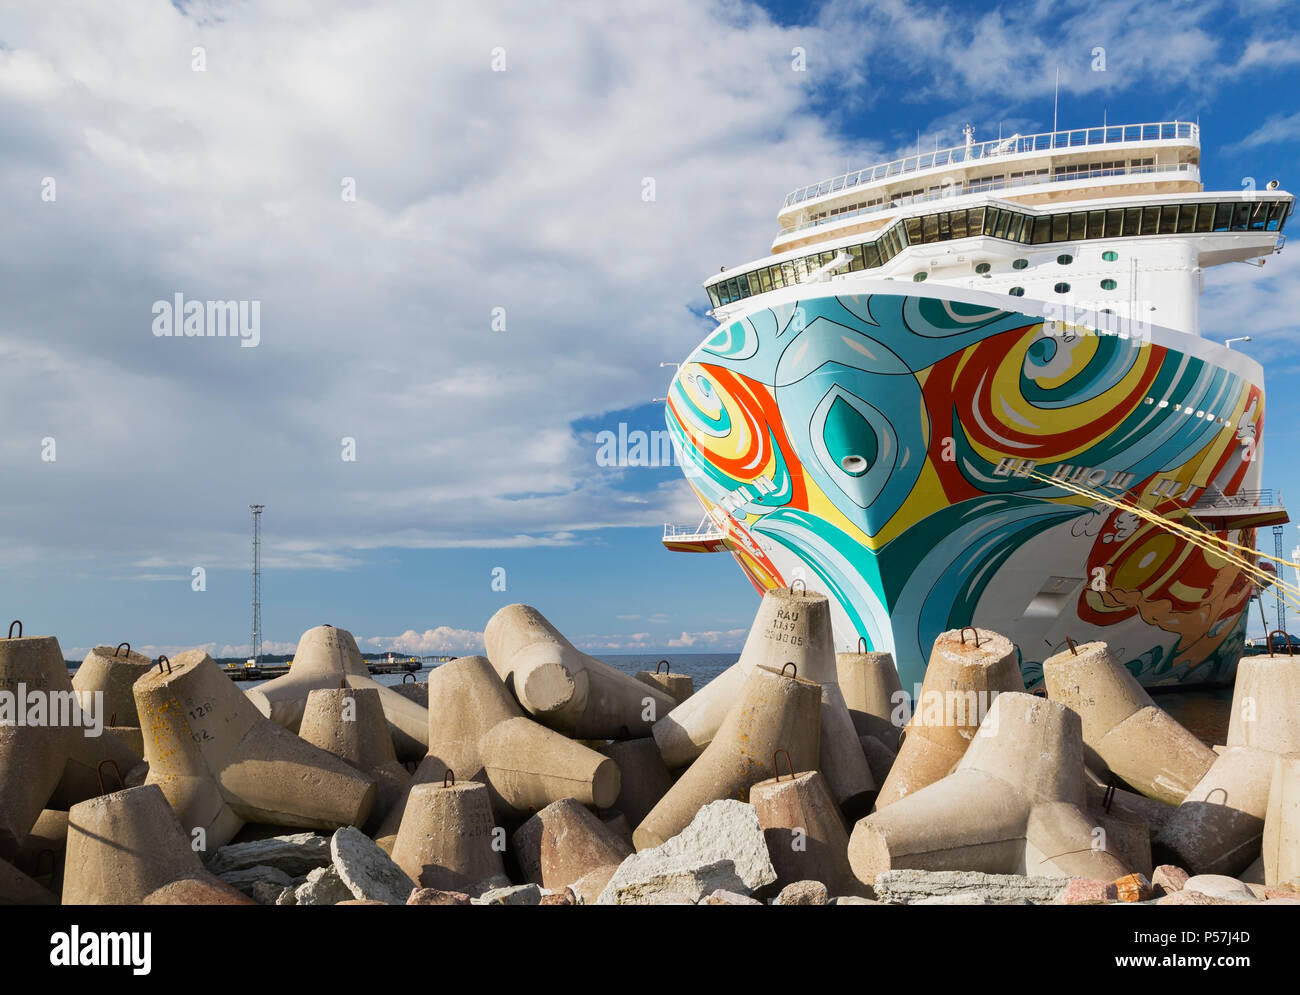 Norwegian Getaway cruise ship moored in the port of Tallinn, Estonia - Stock Image